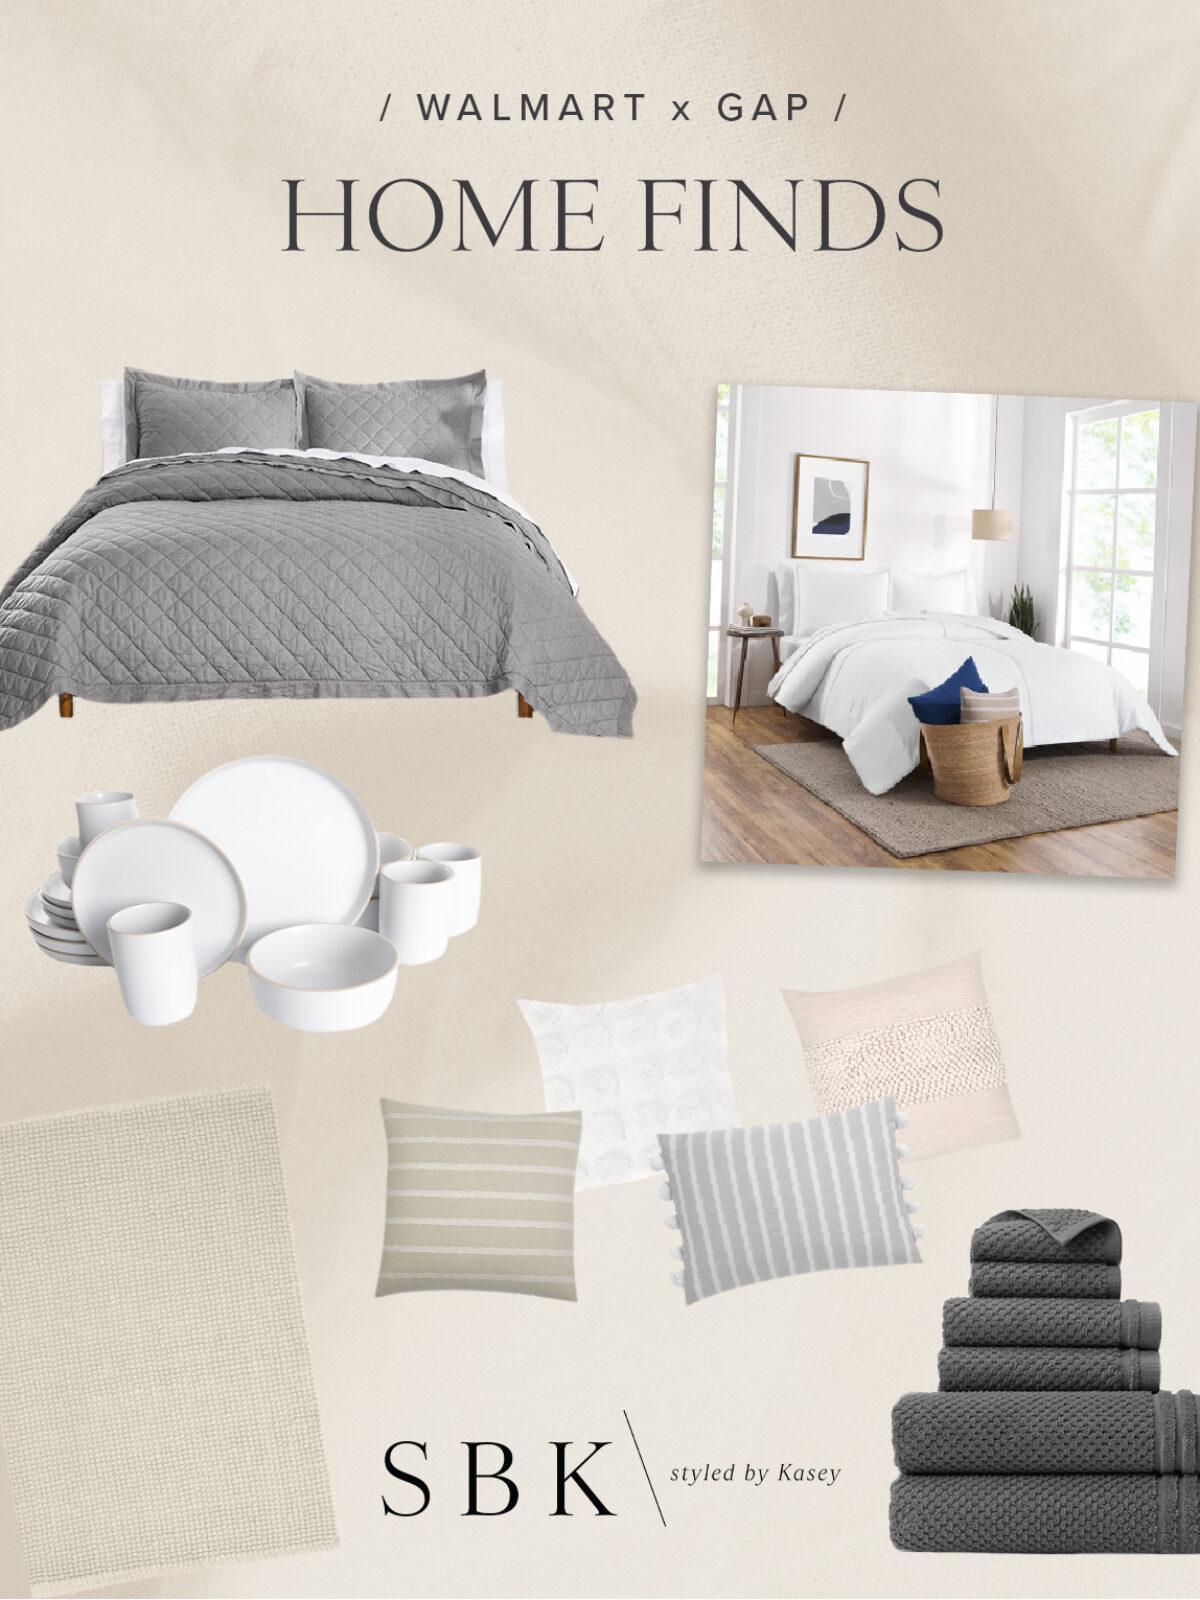 Walmart x Gap Home FindsBlog Cover